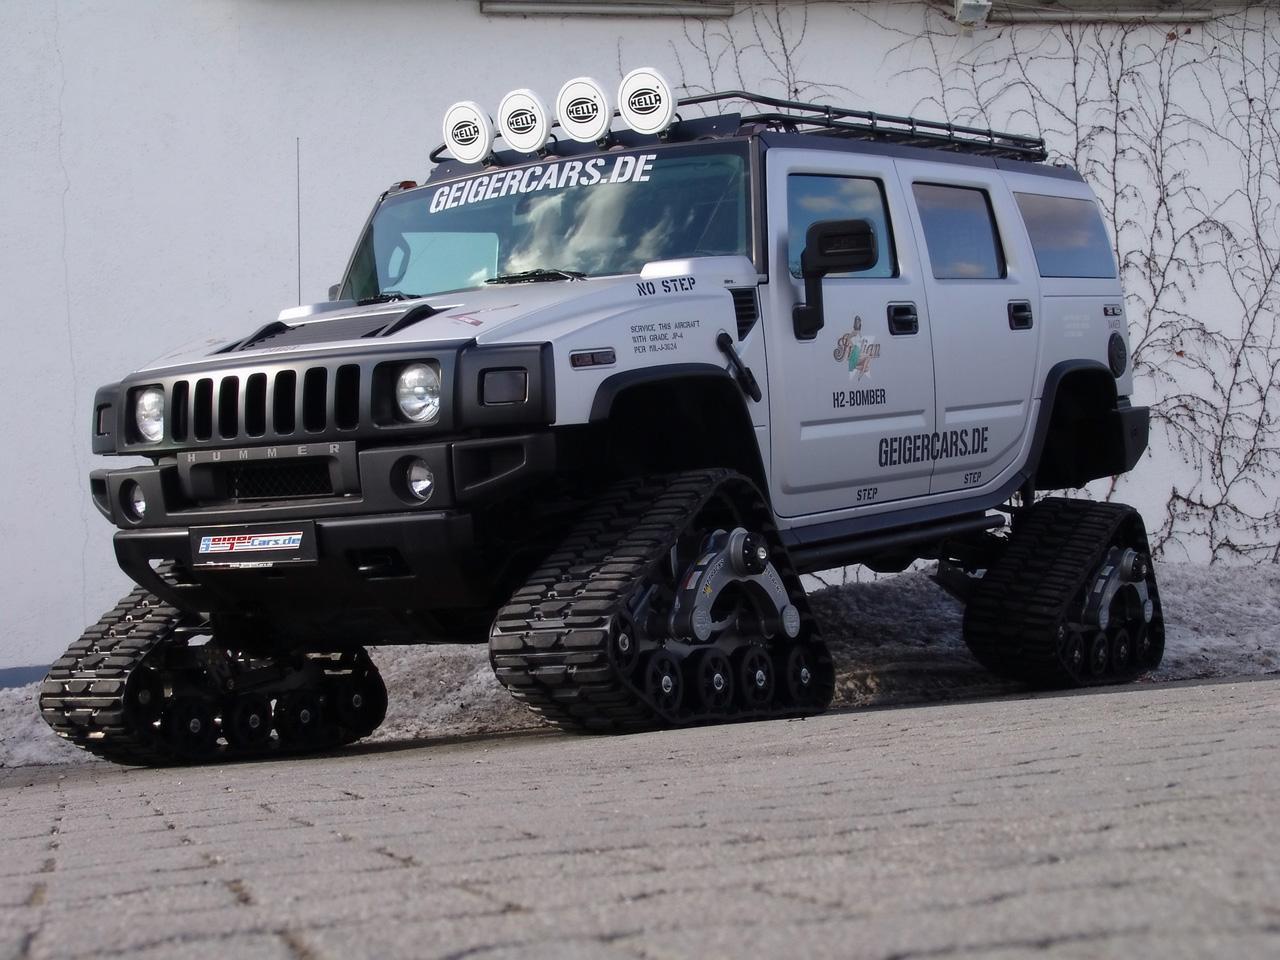 Ashley Wallpaper Hummer Car Wallpapers Hd And Hummer Car Stunts Hd